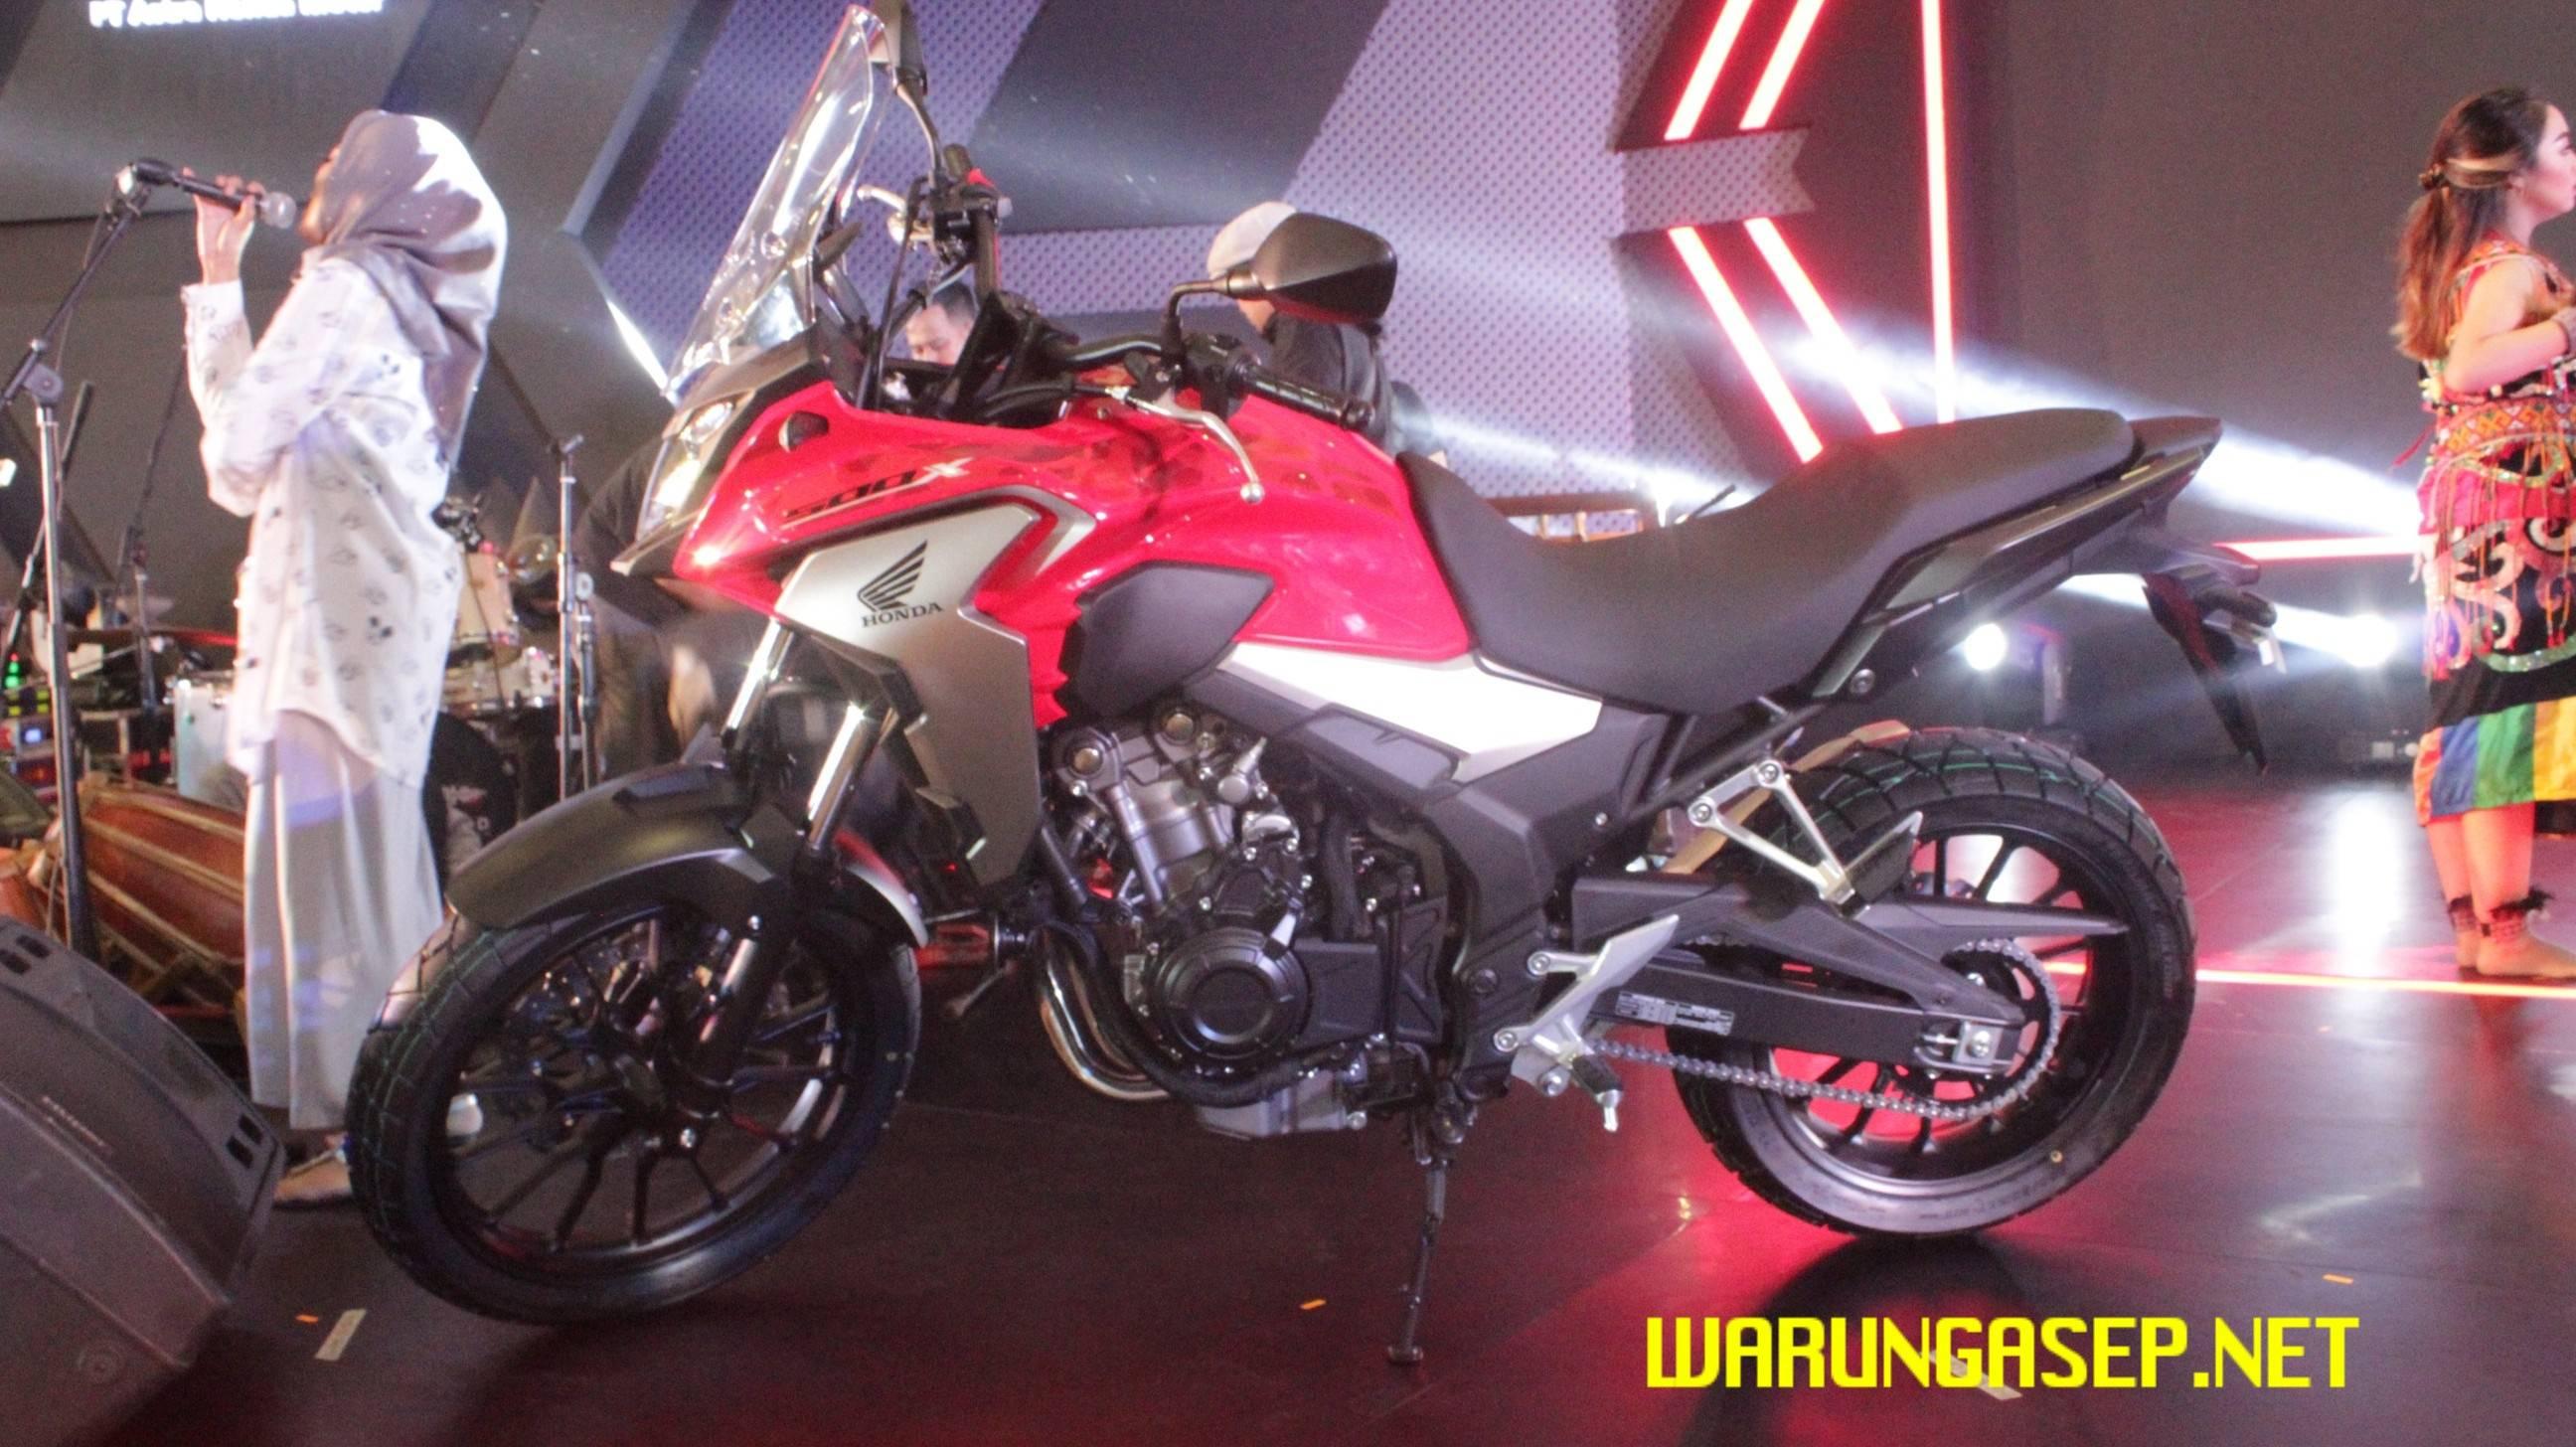 New Honda CBR500R 2016… Desain Baru, Knalpot Baru